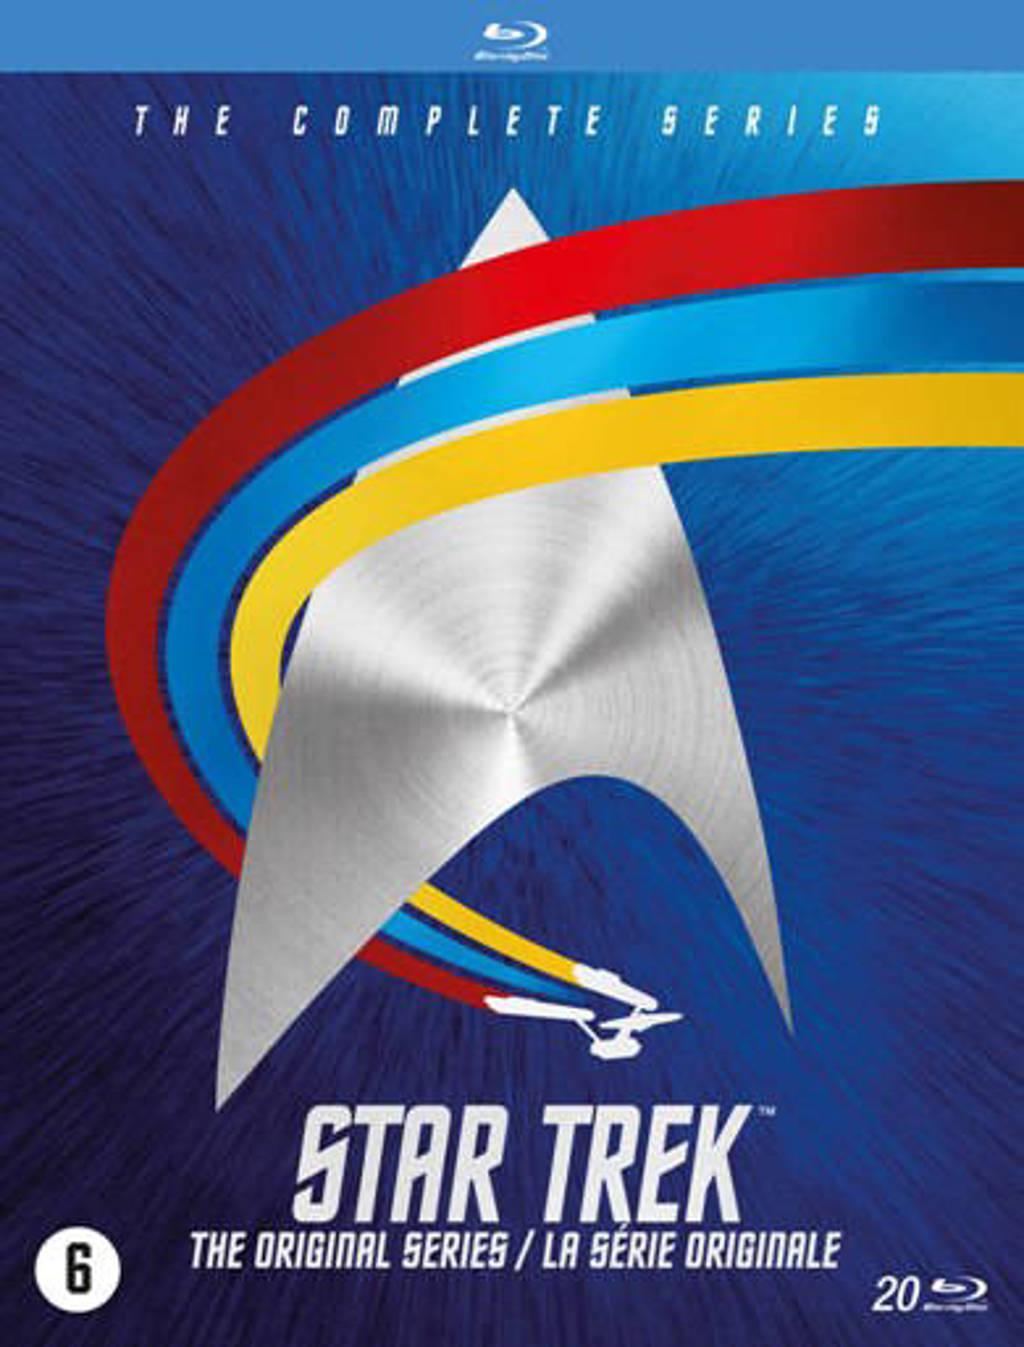 Star trek original series - Complete collection (Blu-ray)